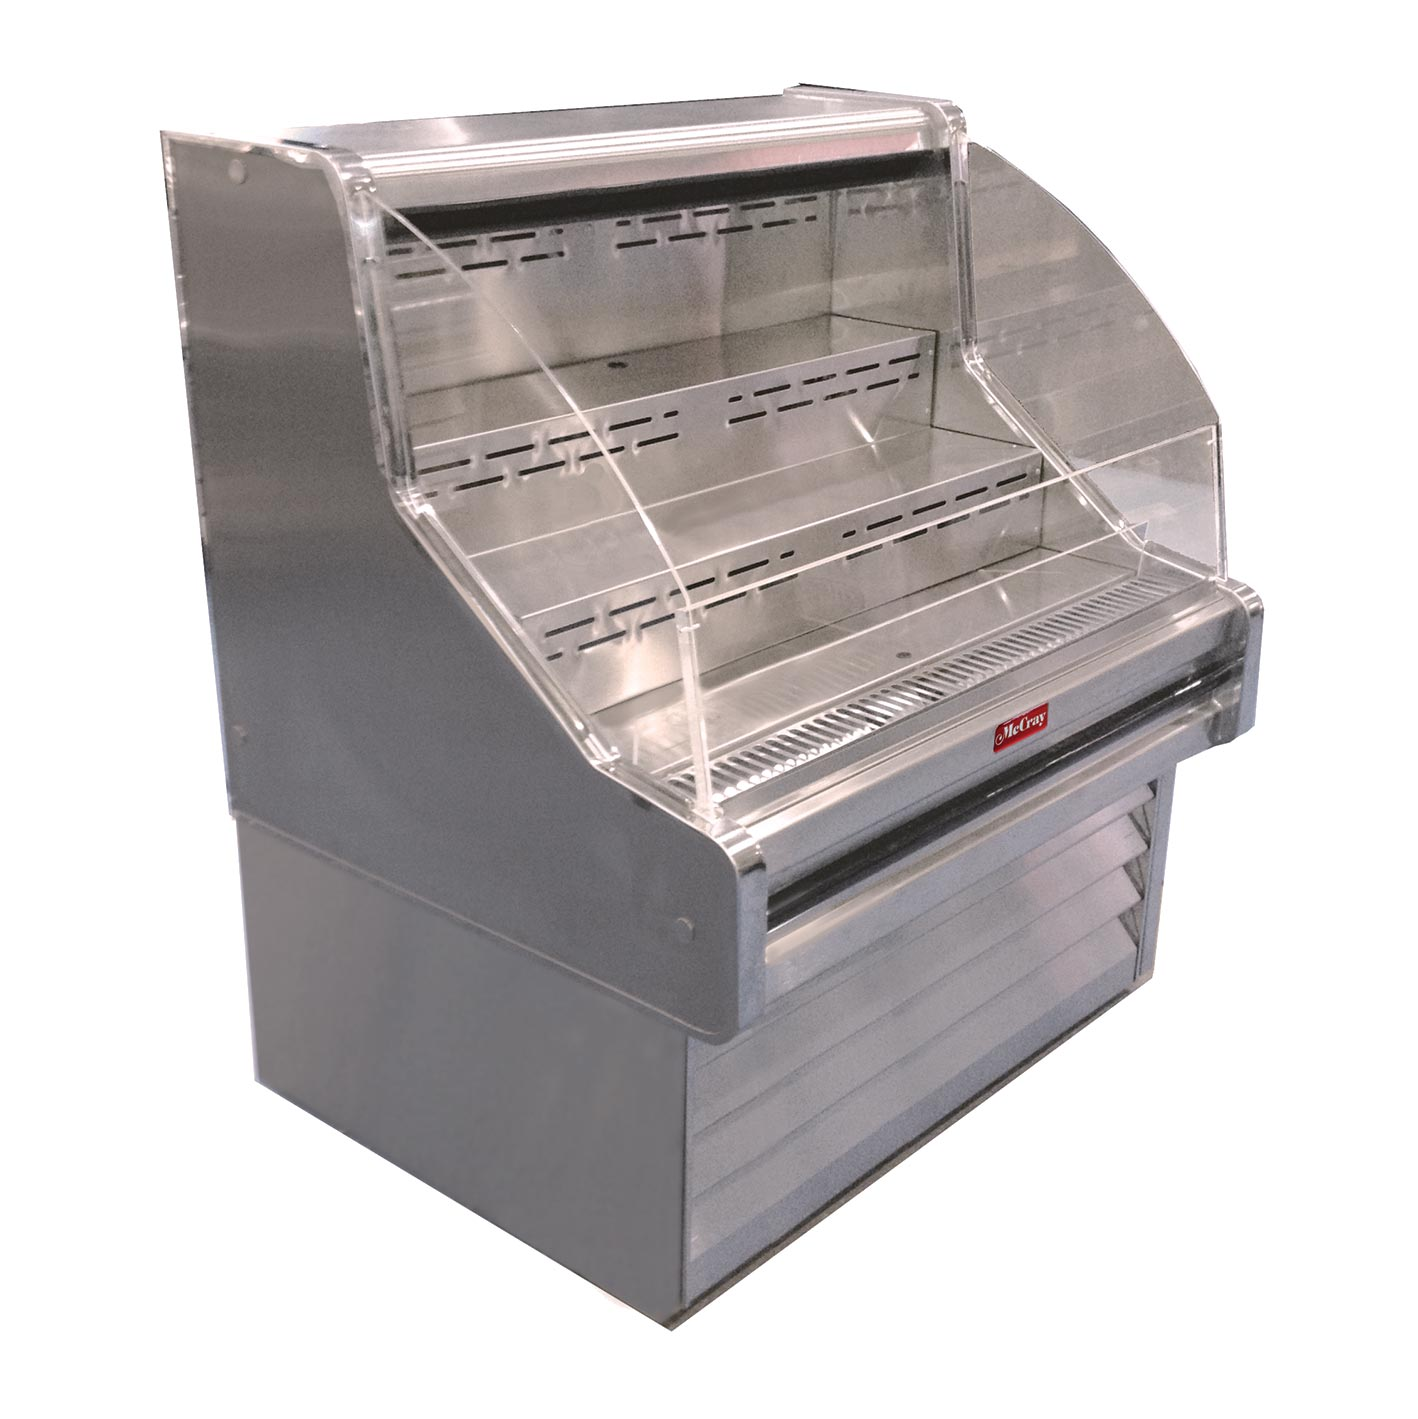 Howard-McCray SC-OS35E-4C-B merchandiser, open refrigerated display